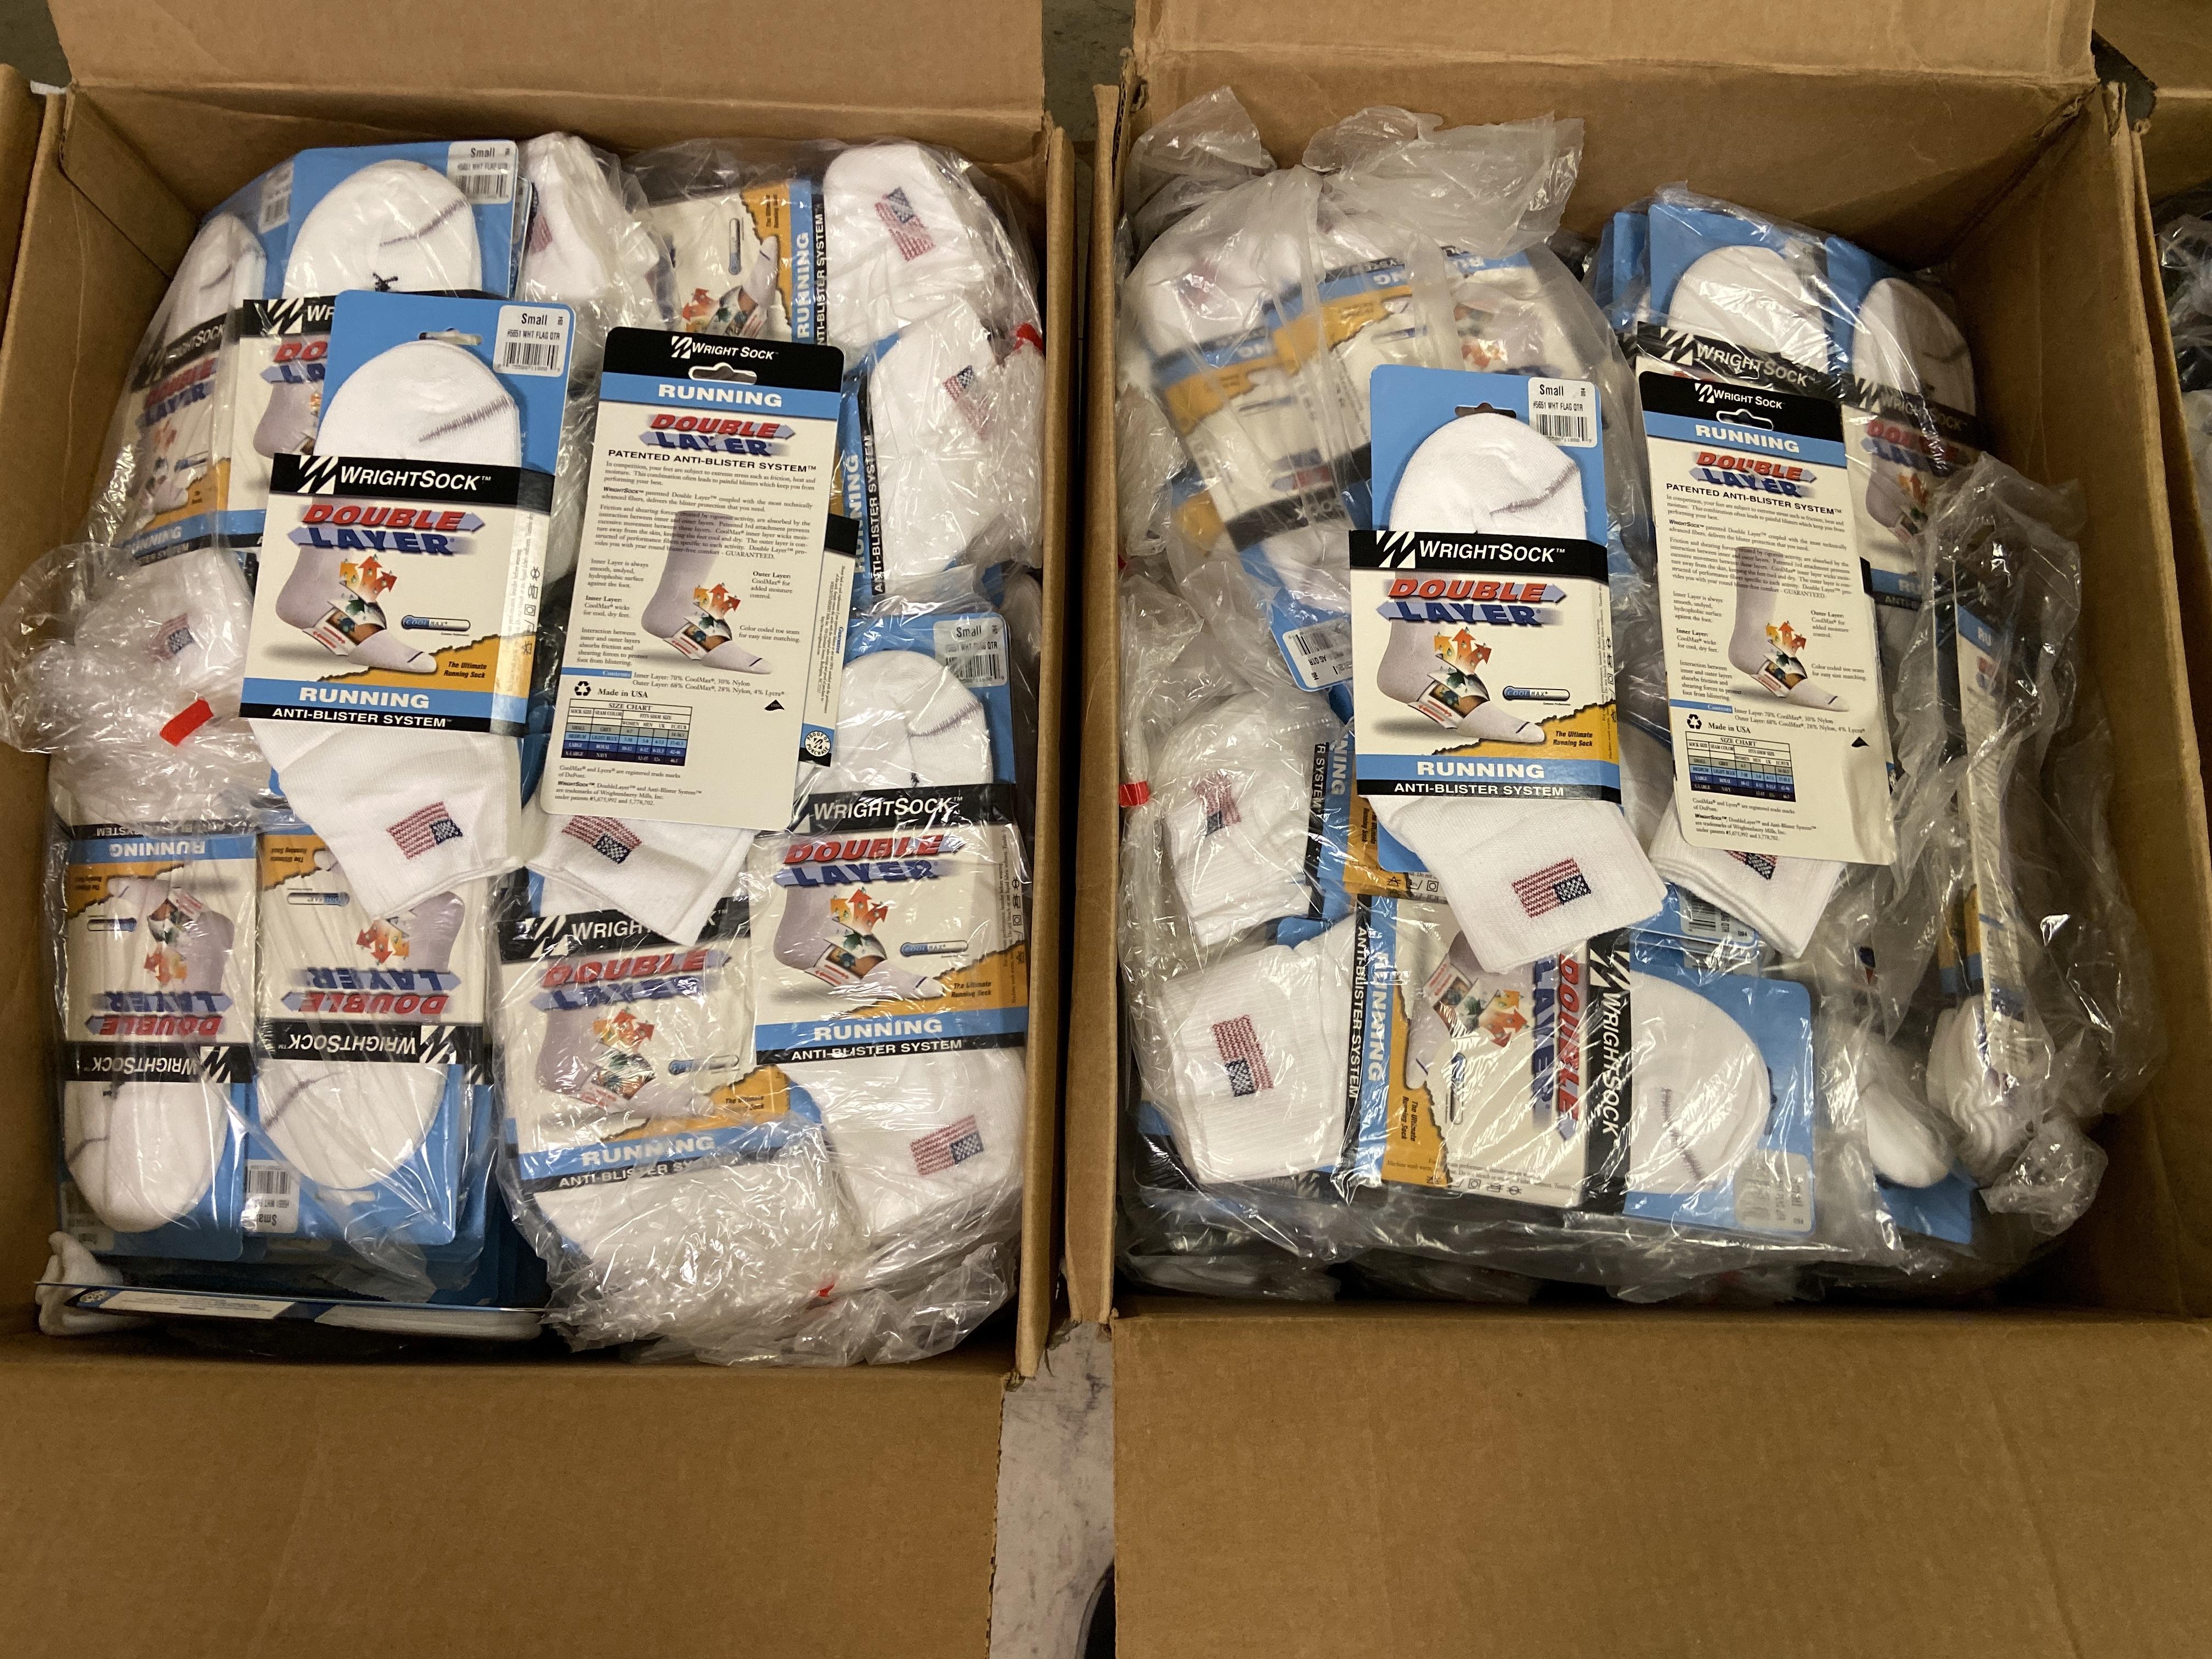 Lot 17 - 500+ packs of New Socks, Wrightsock Running, Double Layer, USA America Flag White Lot is